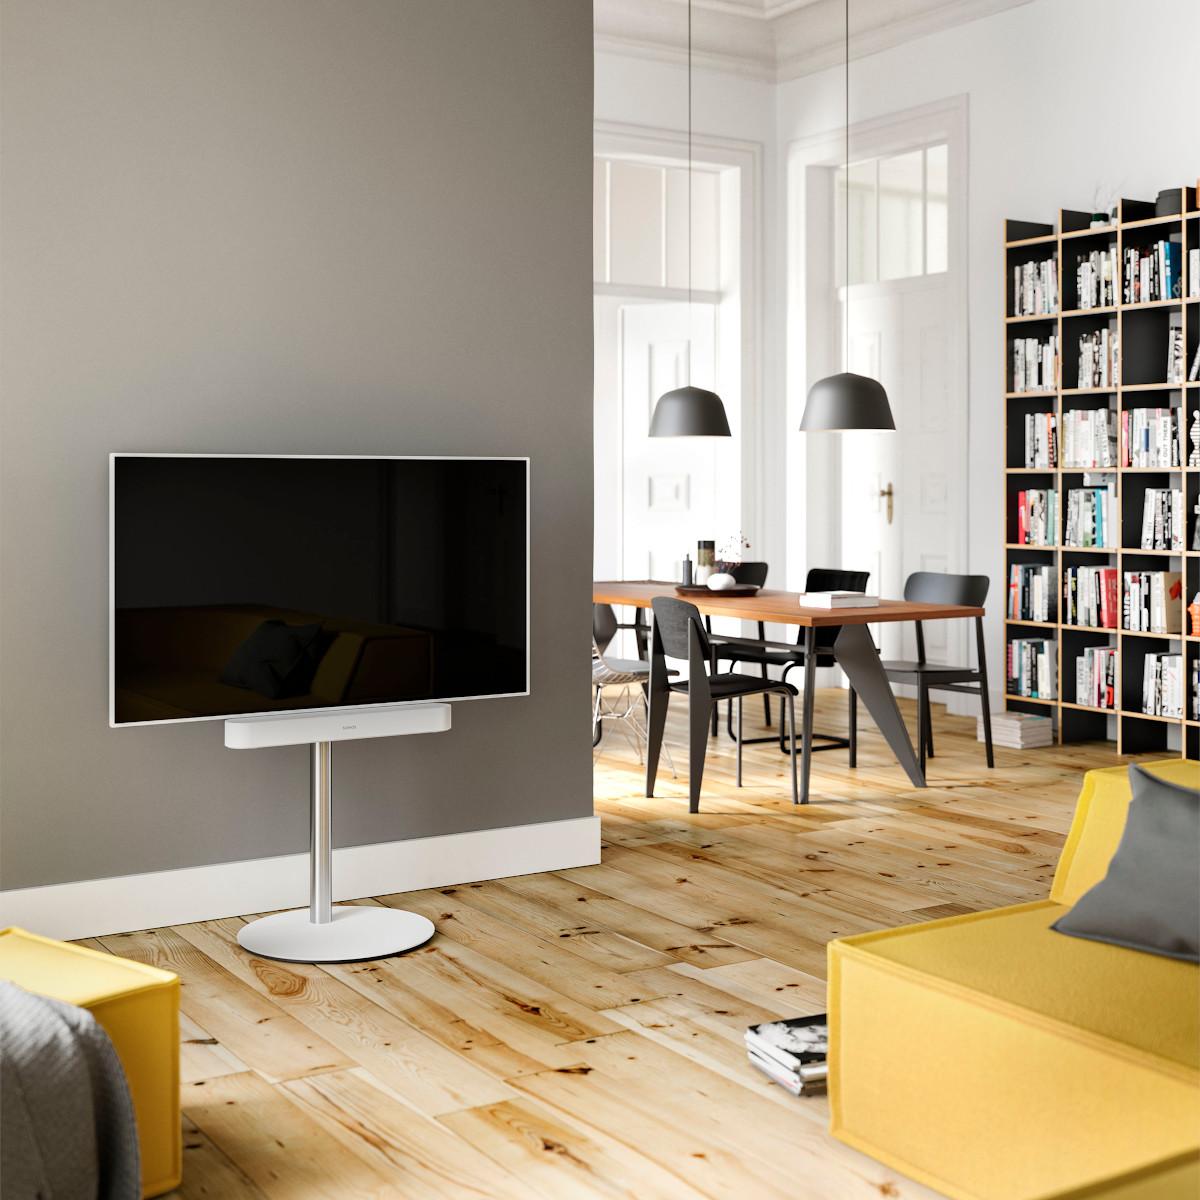 TV Rack, TV Möbel, Fernsehhalter, drehbarer TV Halter, TV Board, Hifi TV Rack, Wandmontage, Hifi Fernsehregal, Spectral.